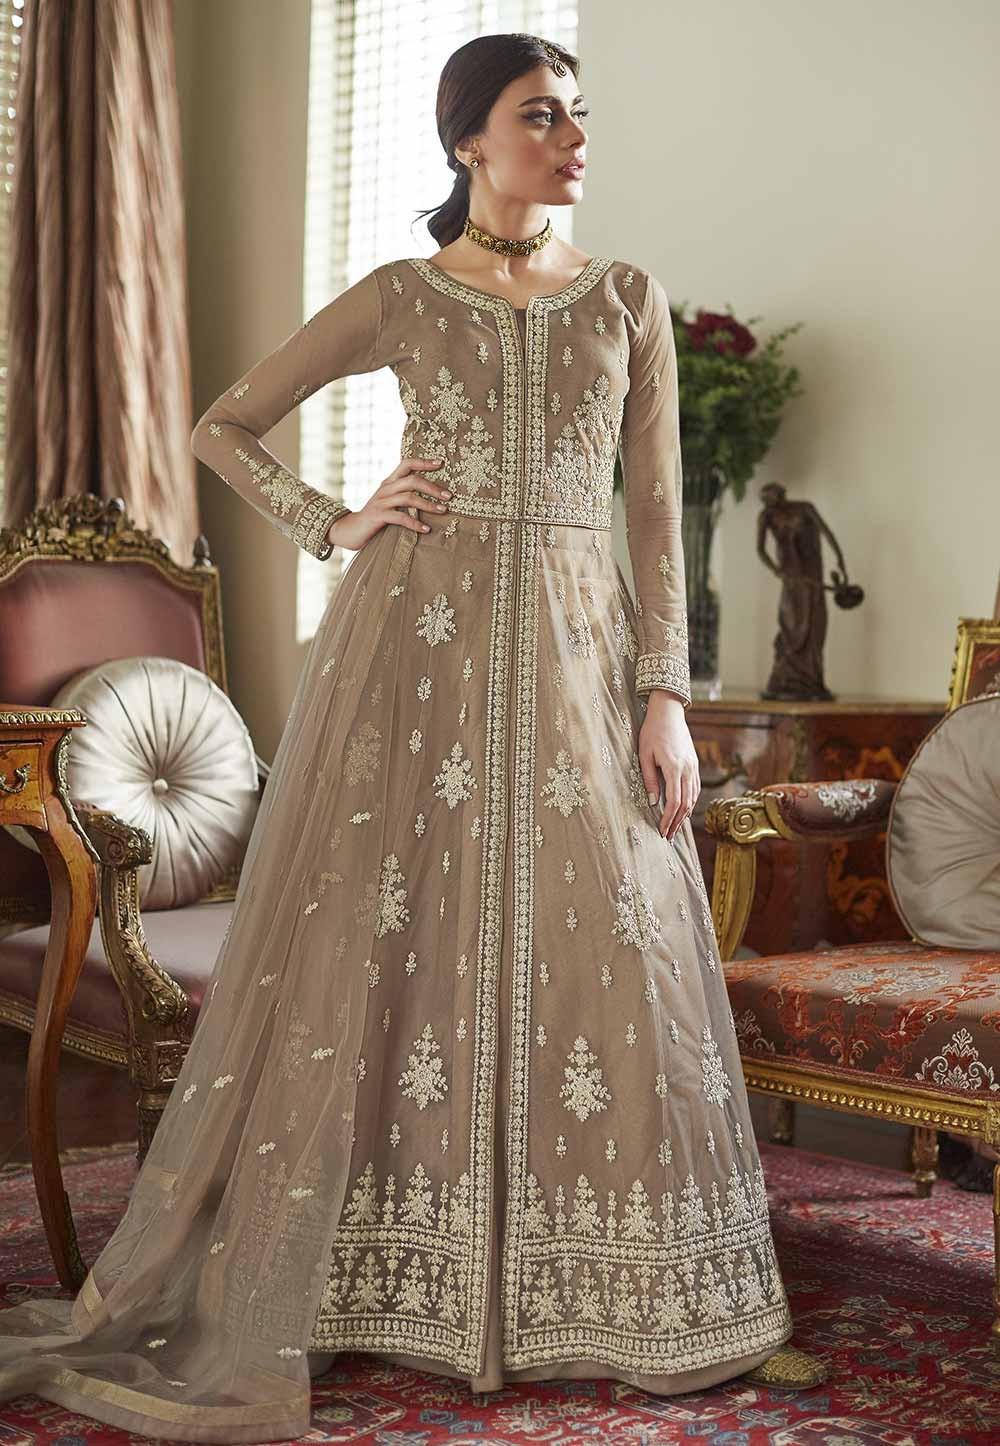 Beige Colour Women's Salwar Suit in Satin,Net Fabric.